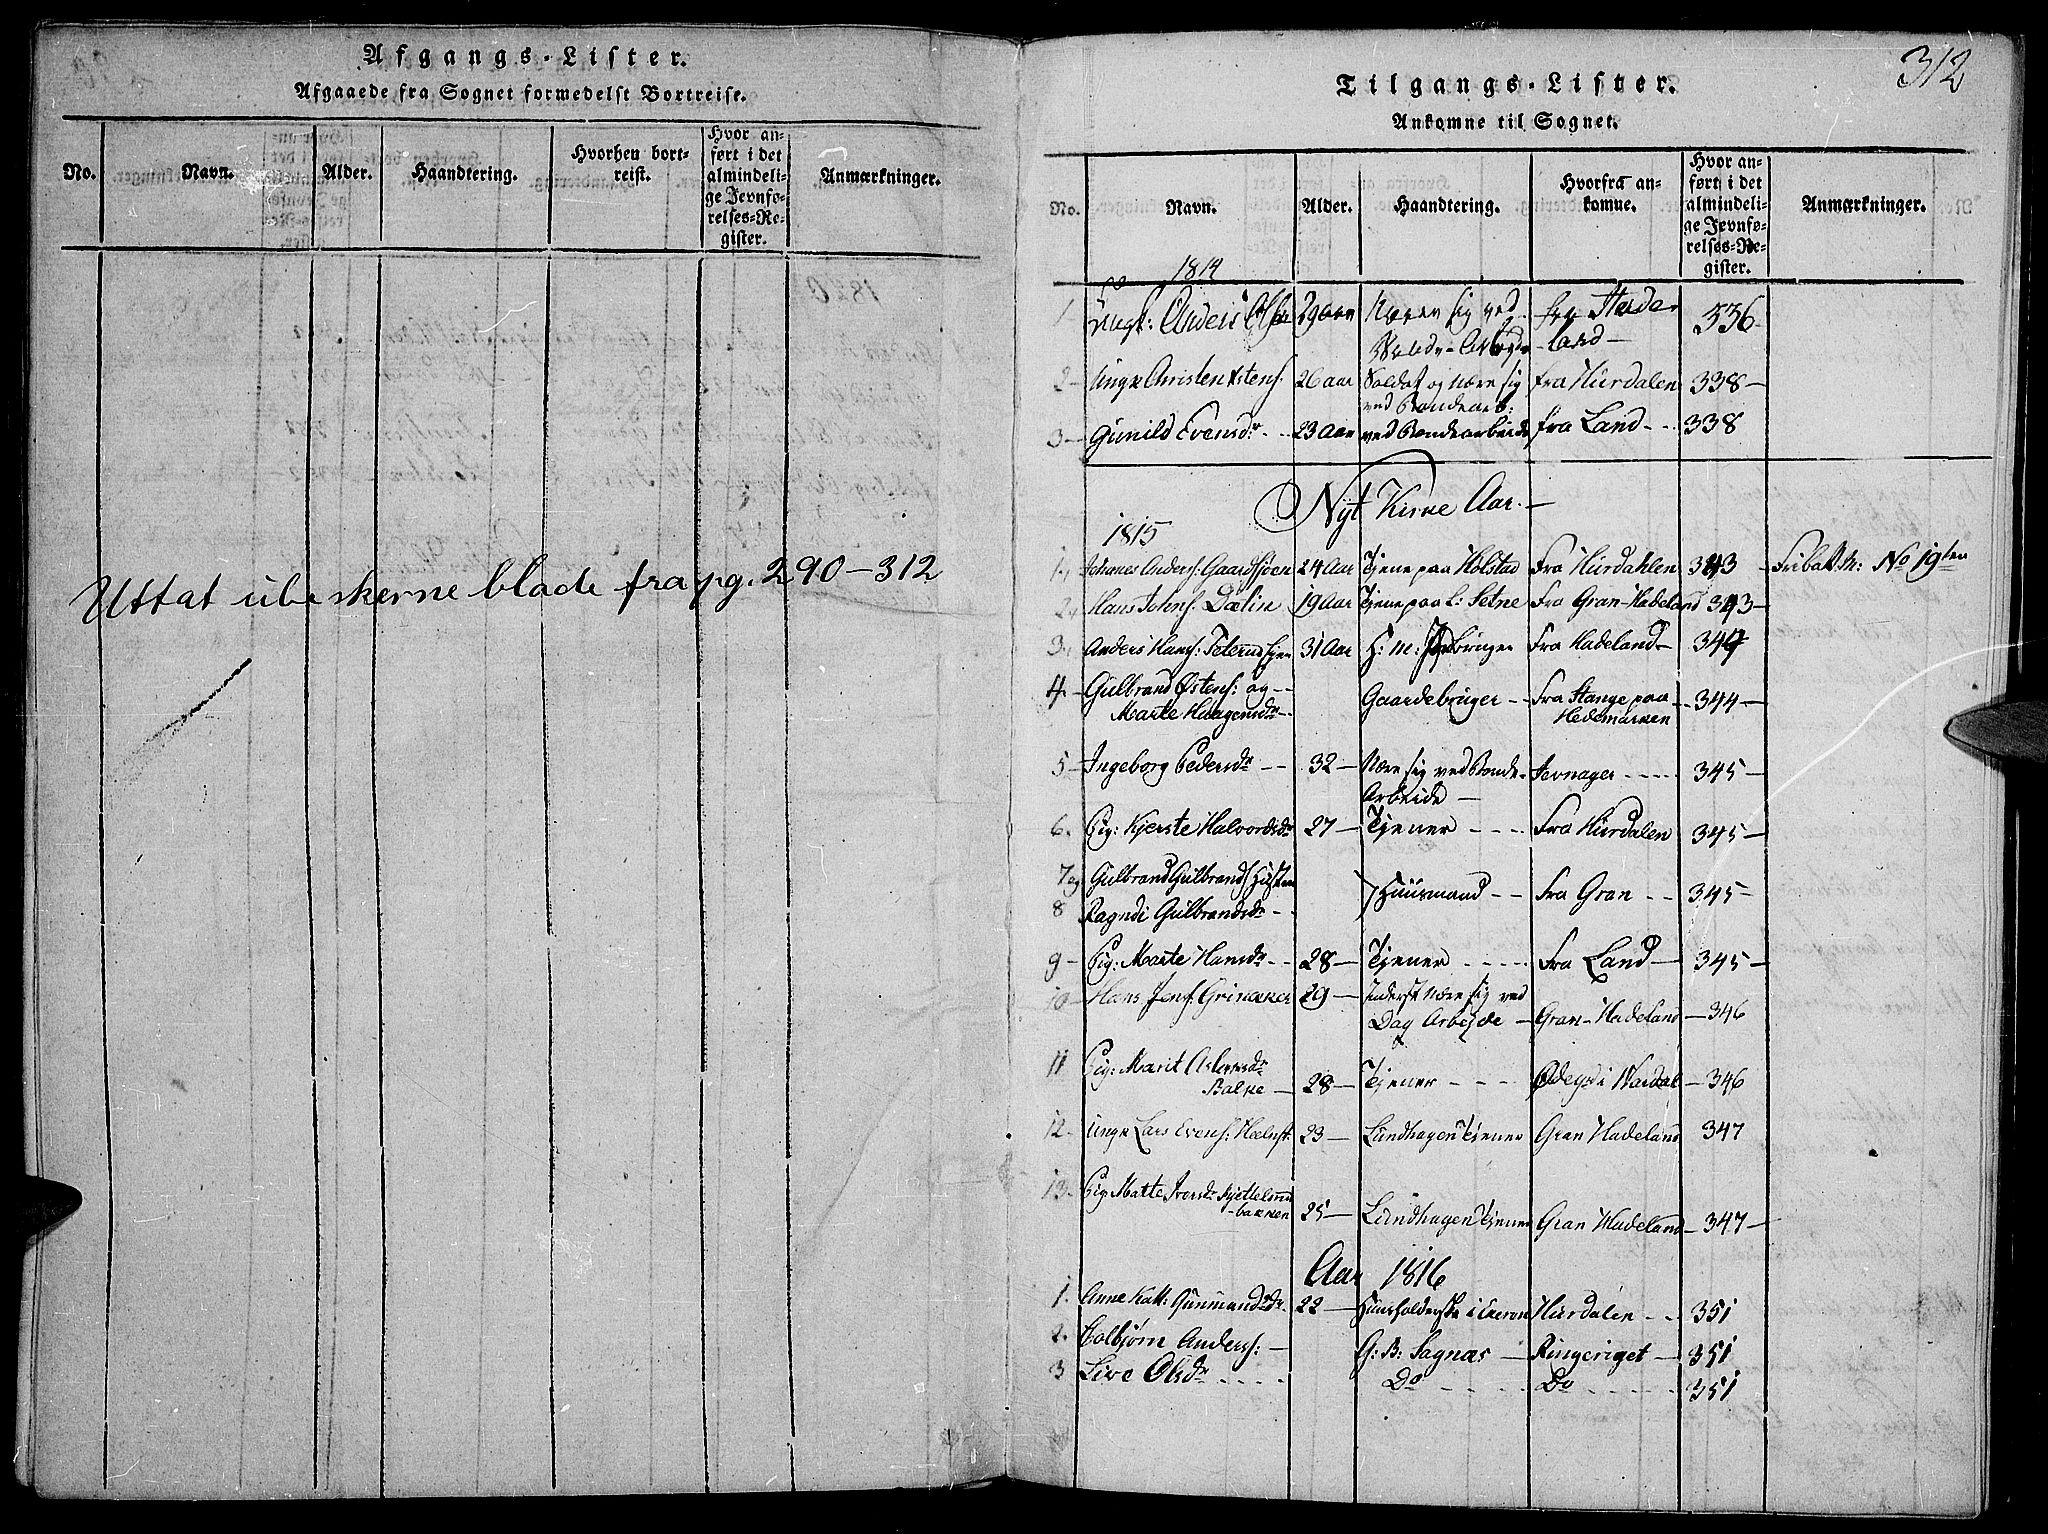 SAH, Toten prestekontor, Ministerialbok nr. 9, 1814-1820, s. 312